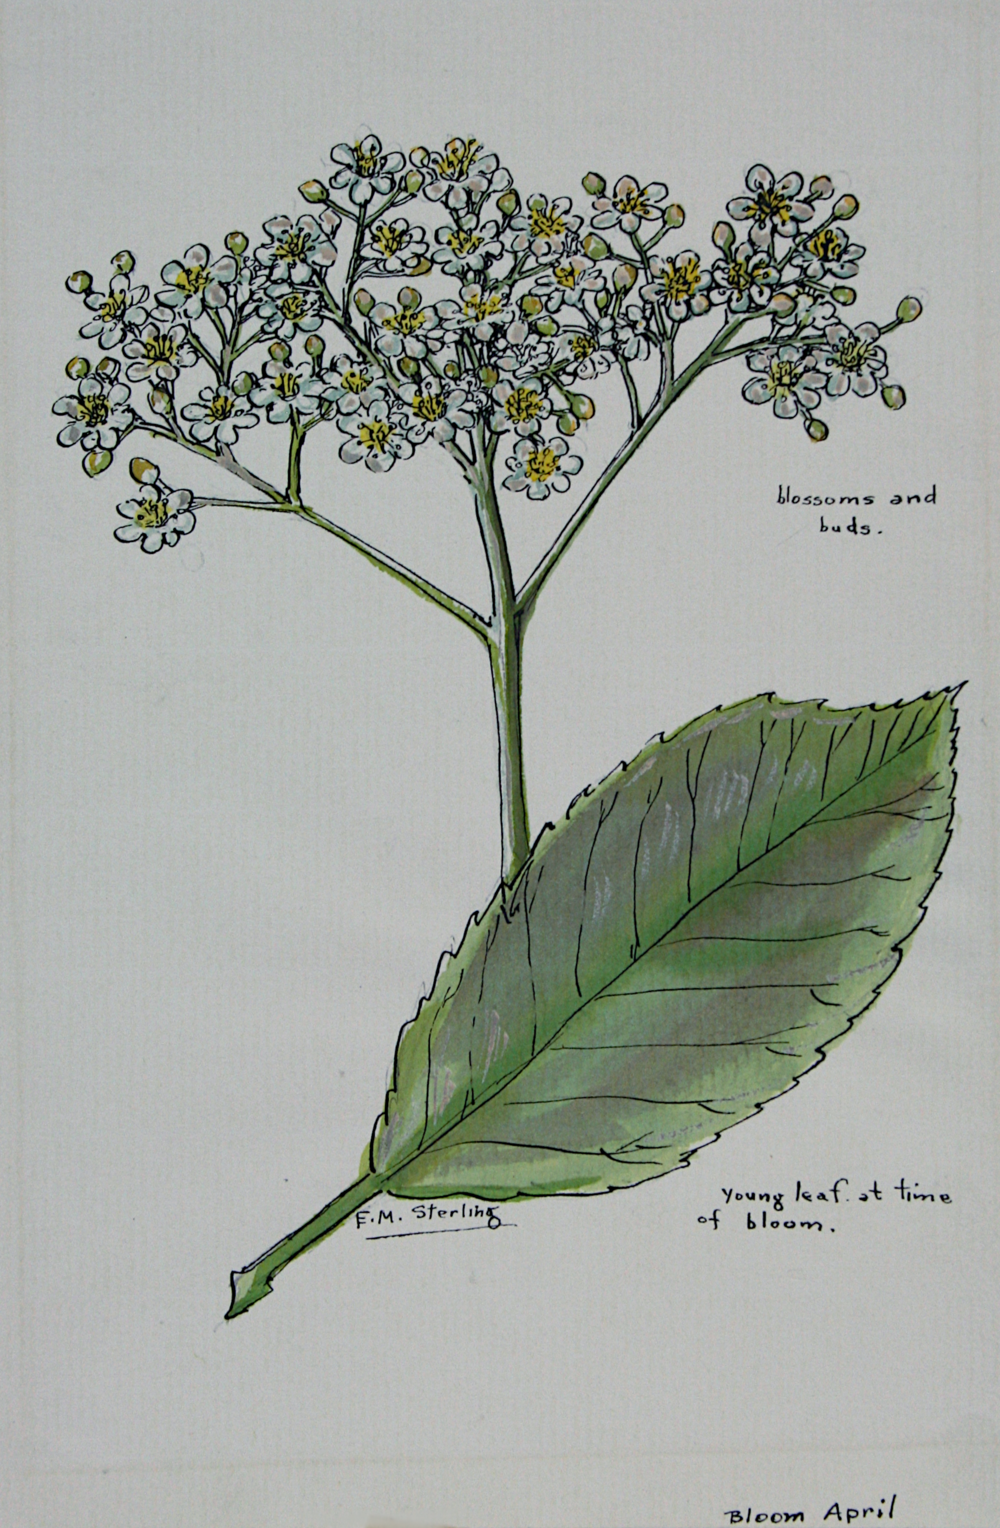 Photinia in Bloom - April